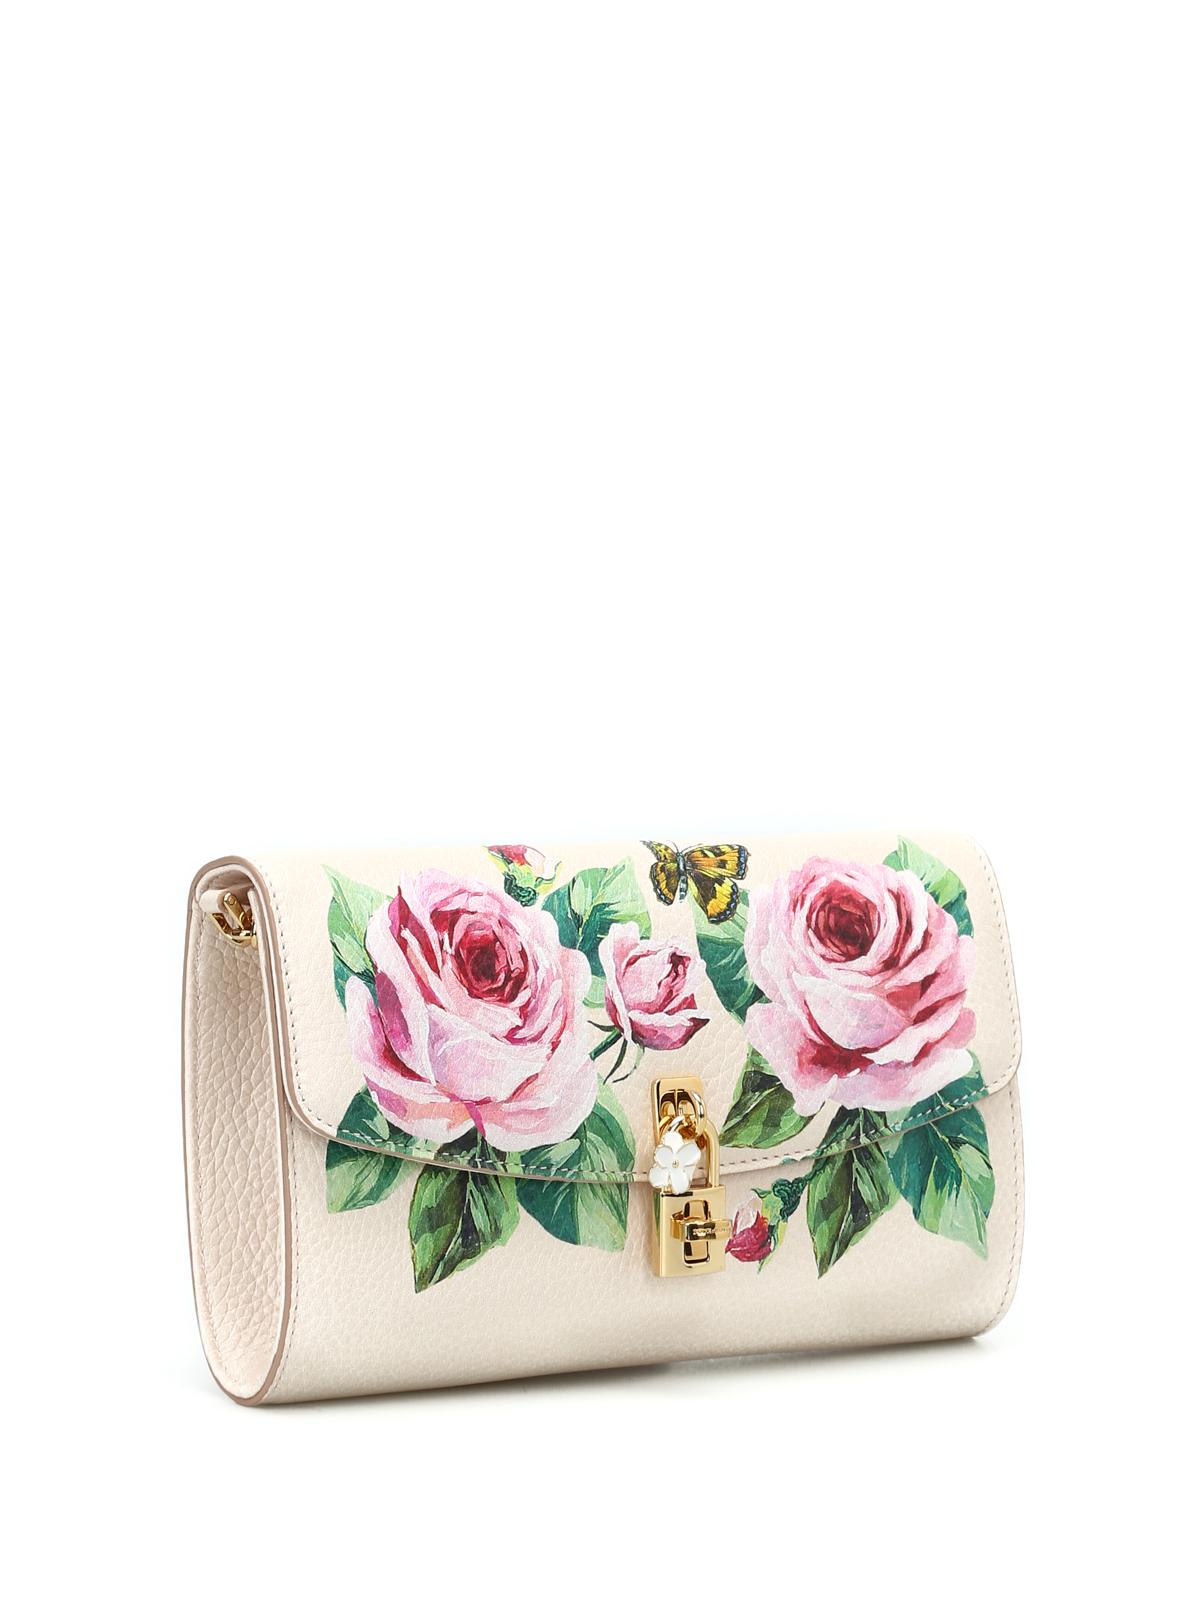 Dolce & Gabbana Roses print grained leather clutch mUGpL9b